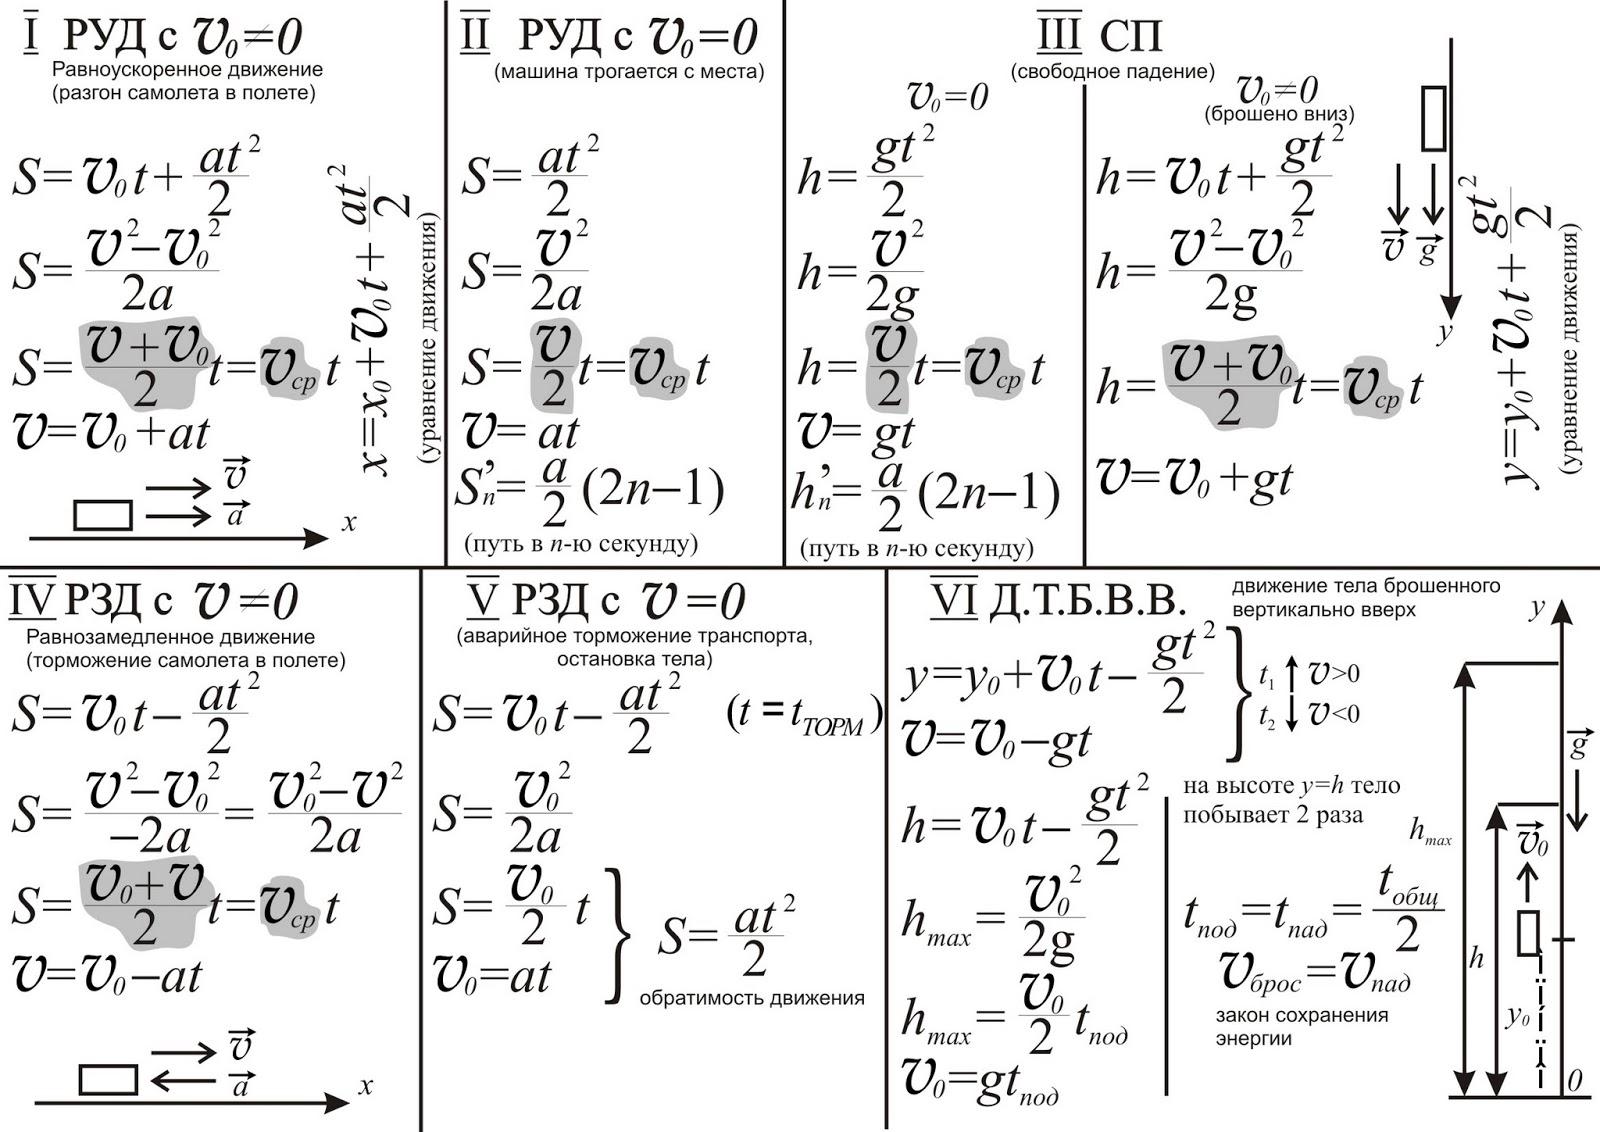 Физике гравитация по шпаргалка ч формулами